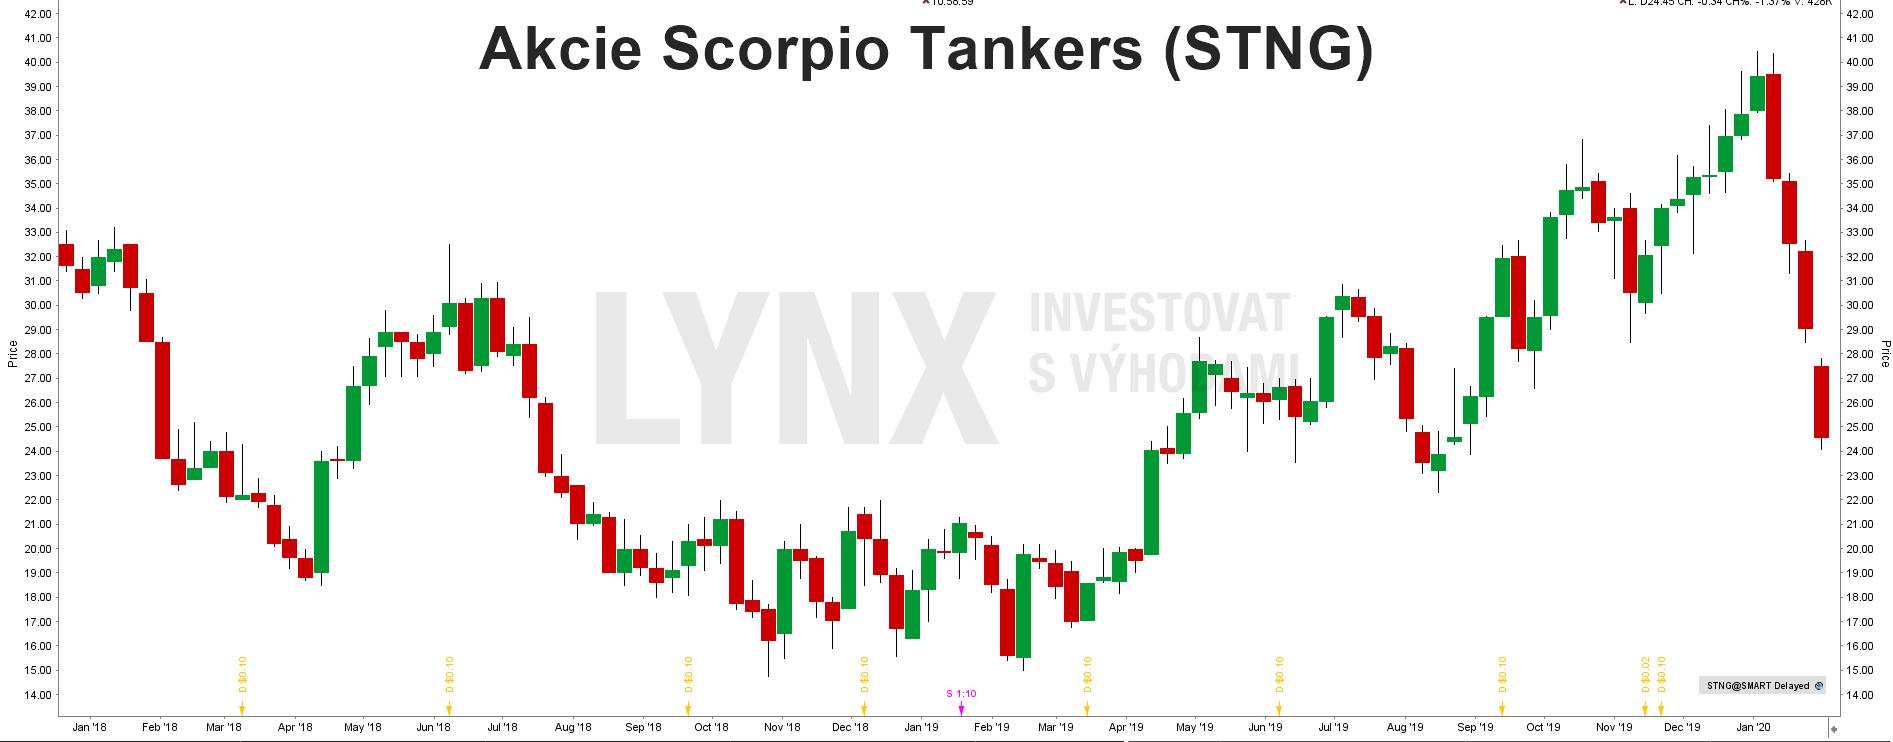 Akcie Scorpio Tankers